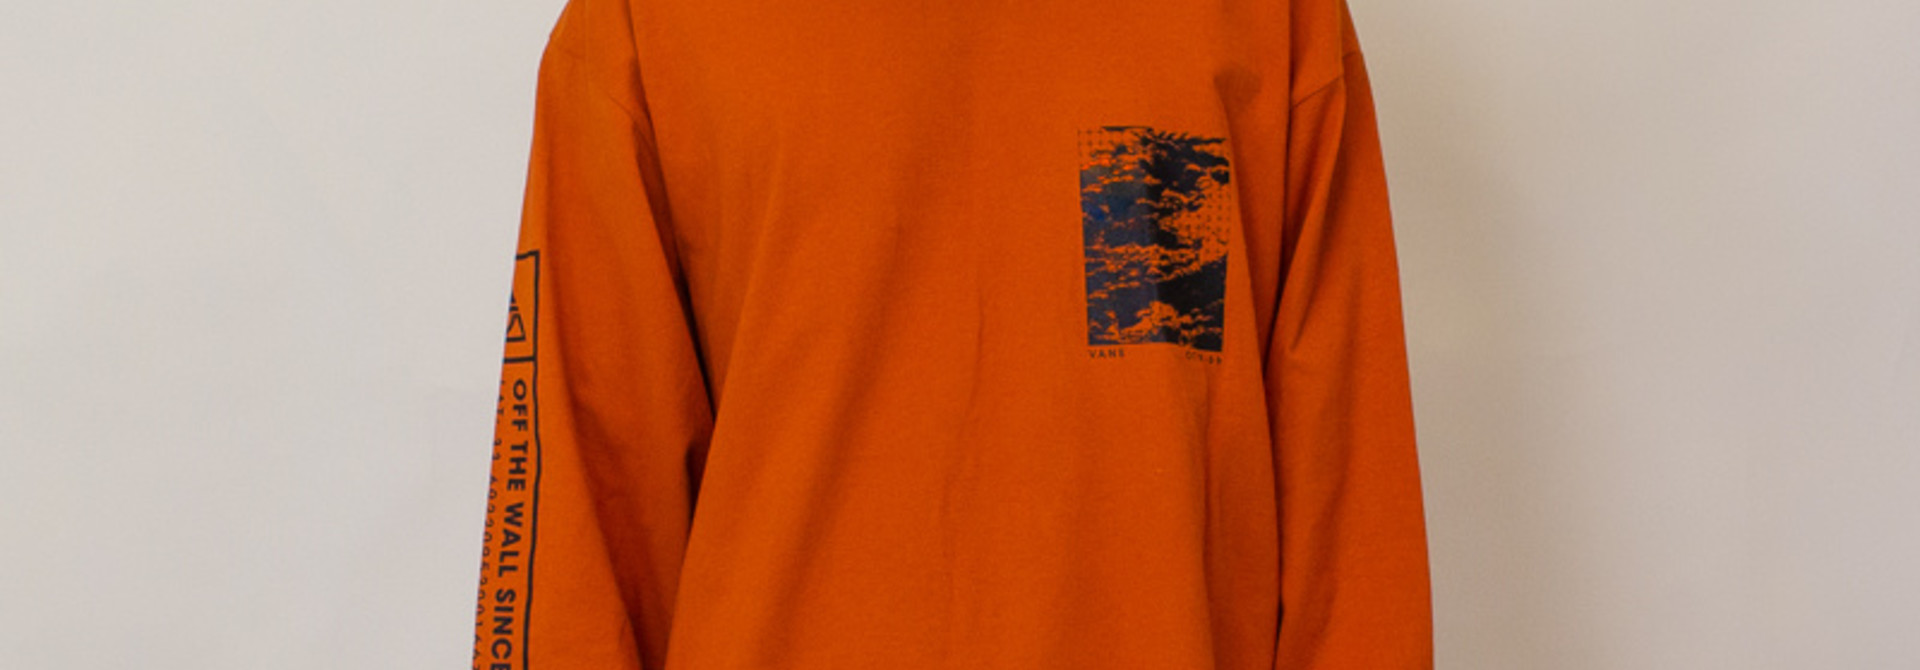 Vans 66 Supply L/S T-Shirt - Orange